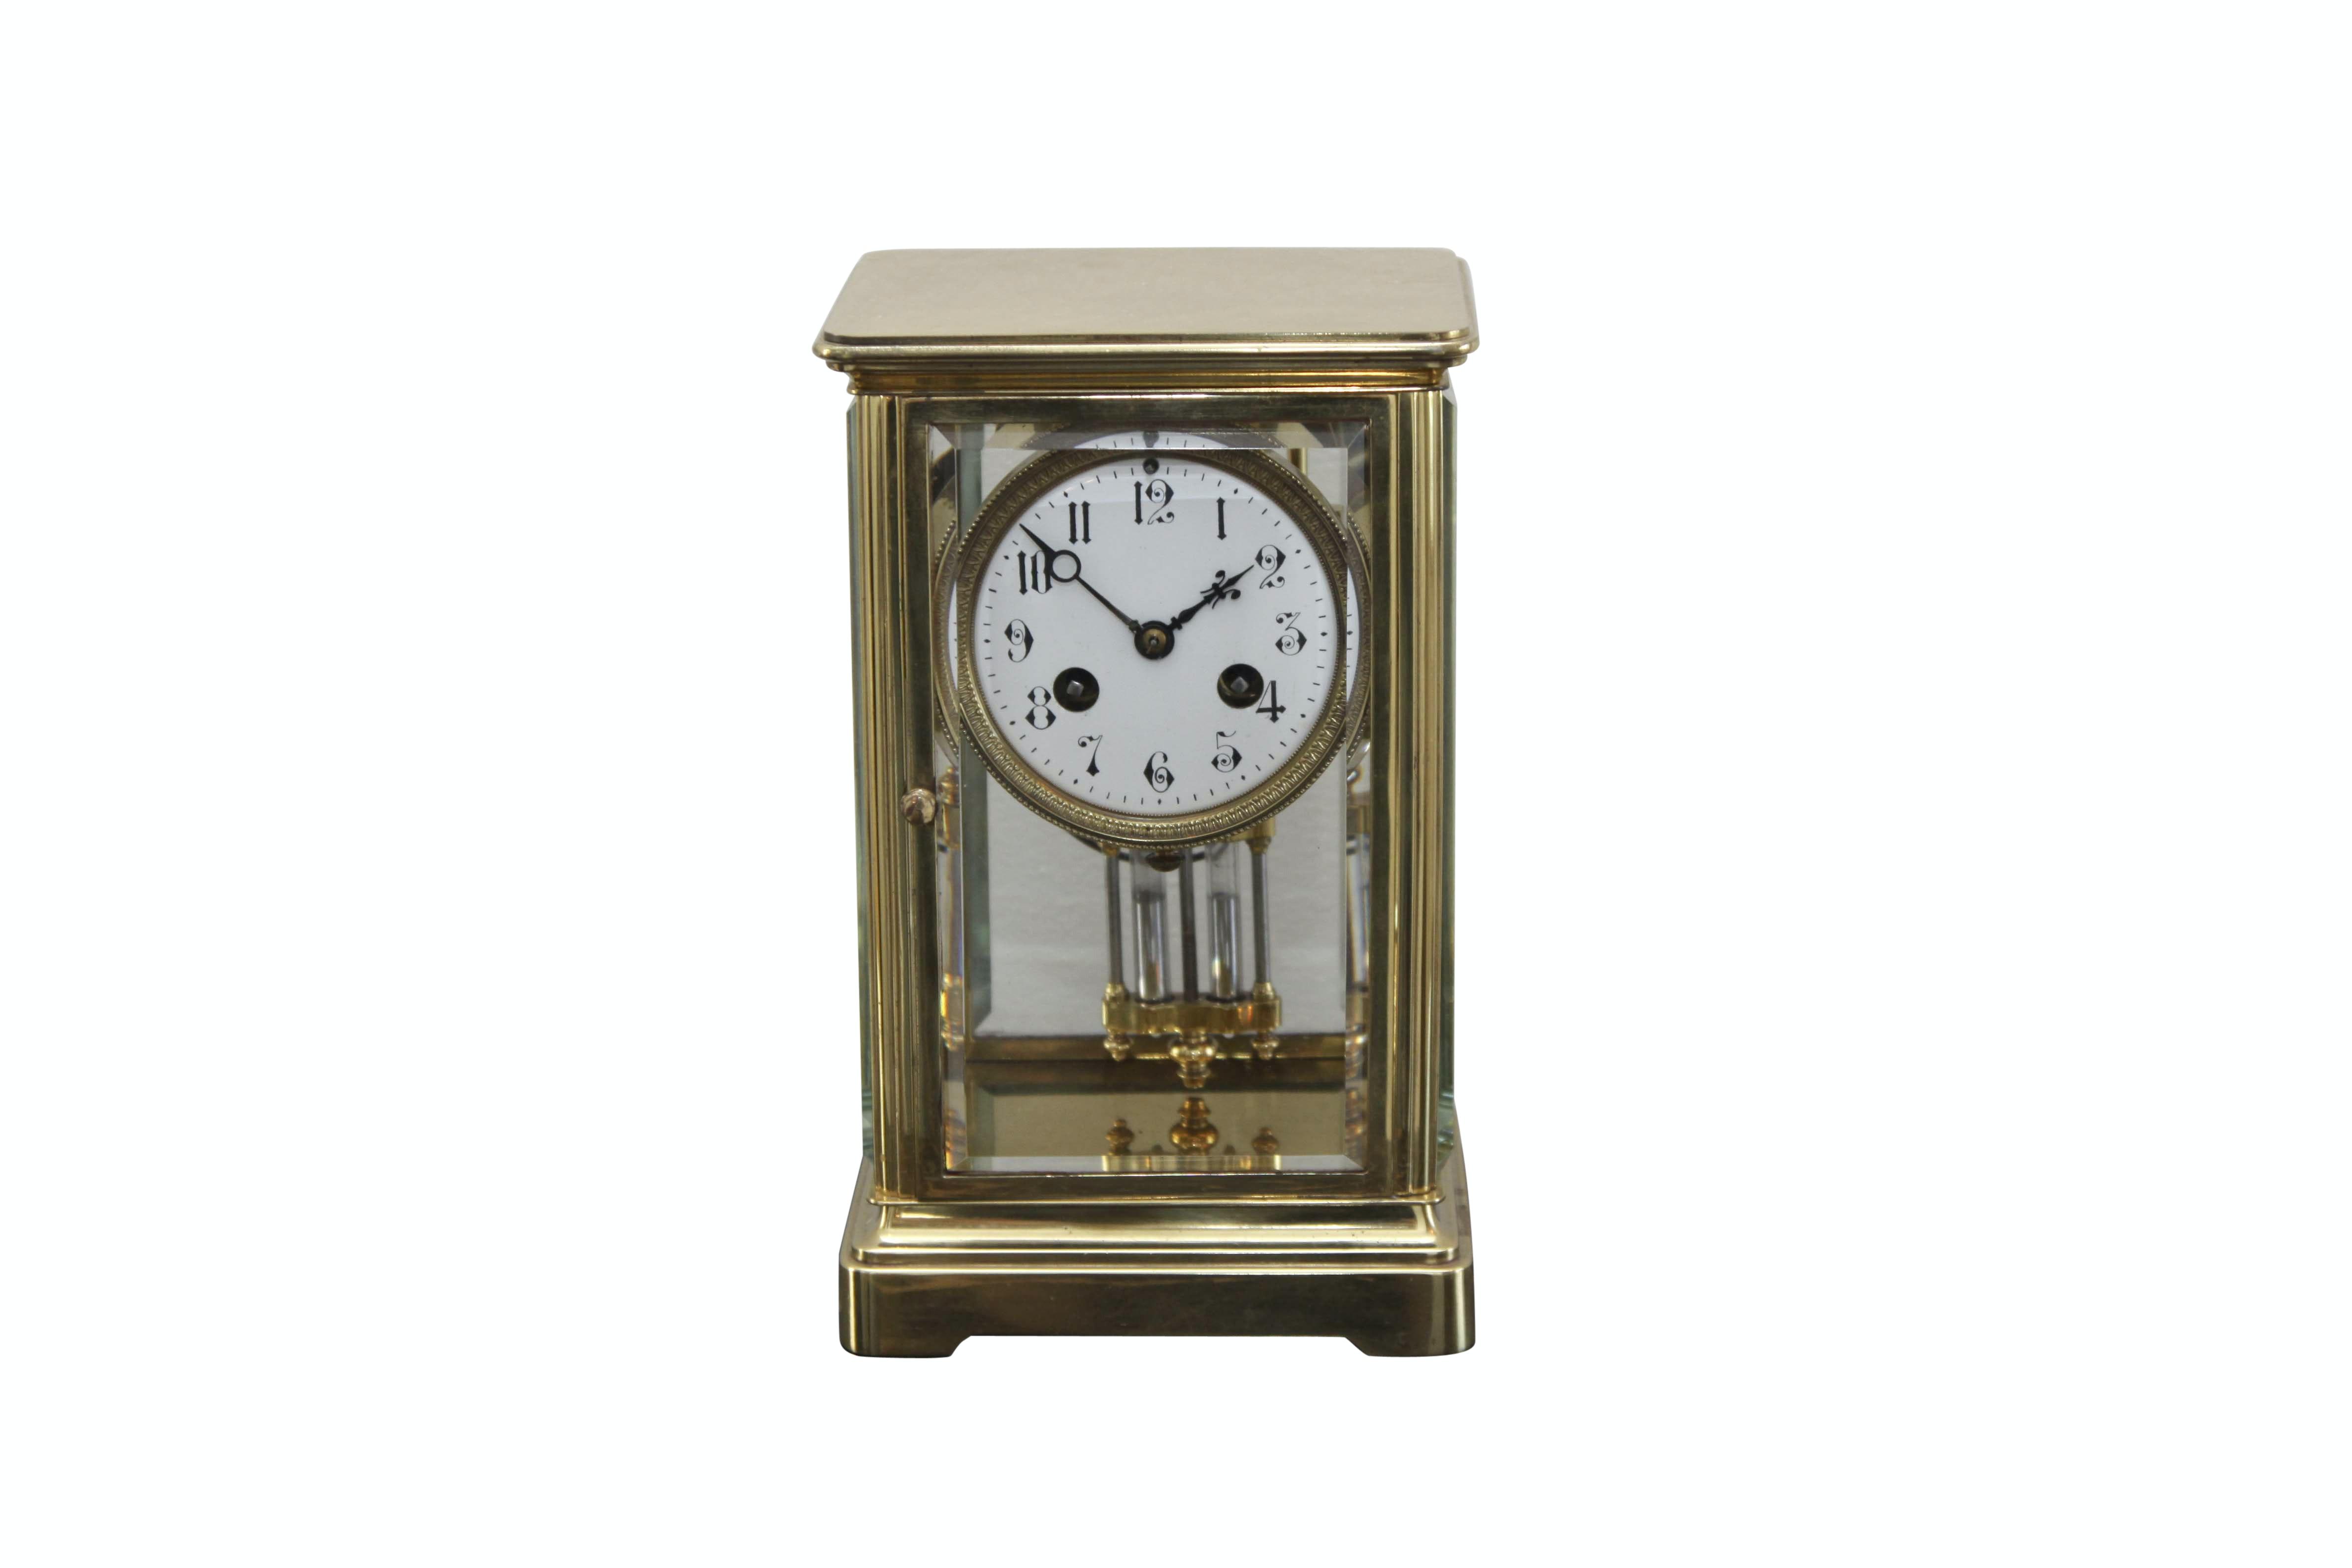 Antique Brass Mantel Clock with Mercury Pendulum